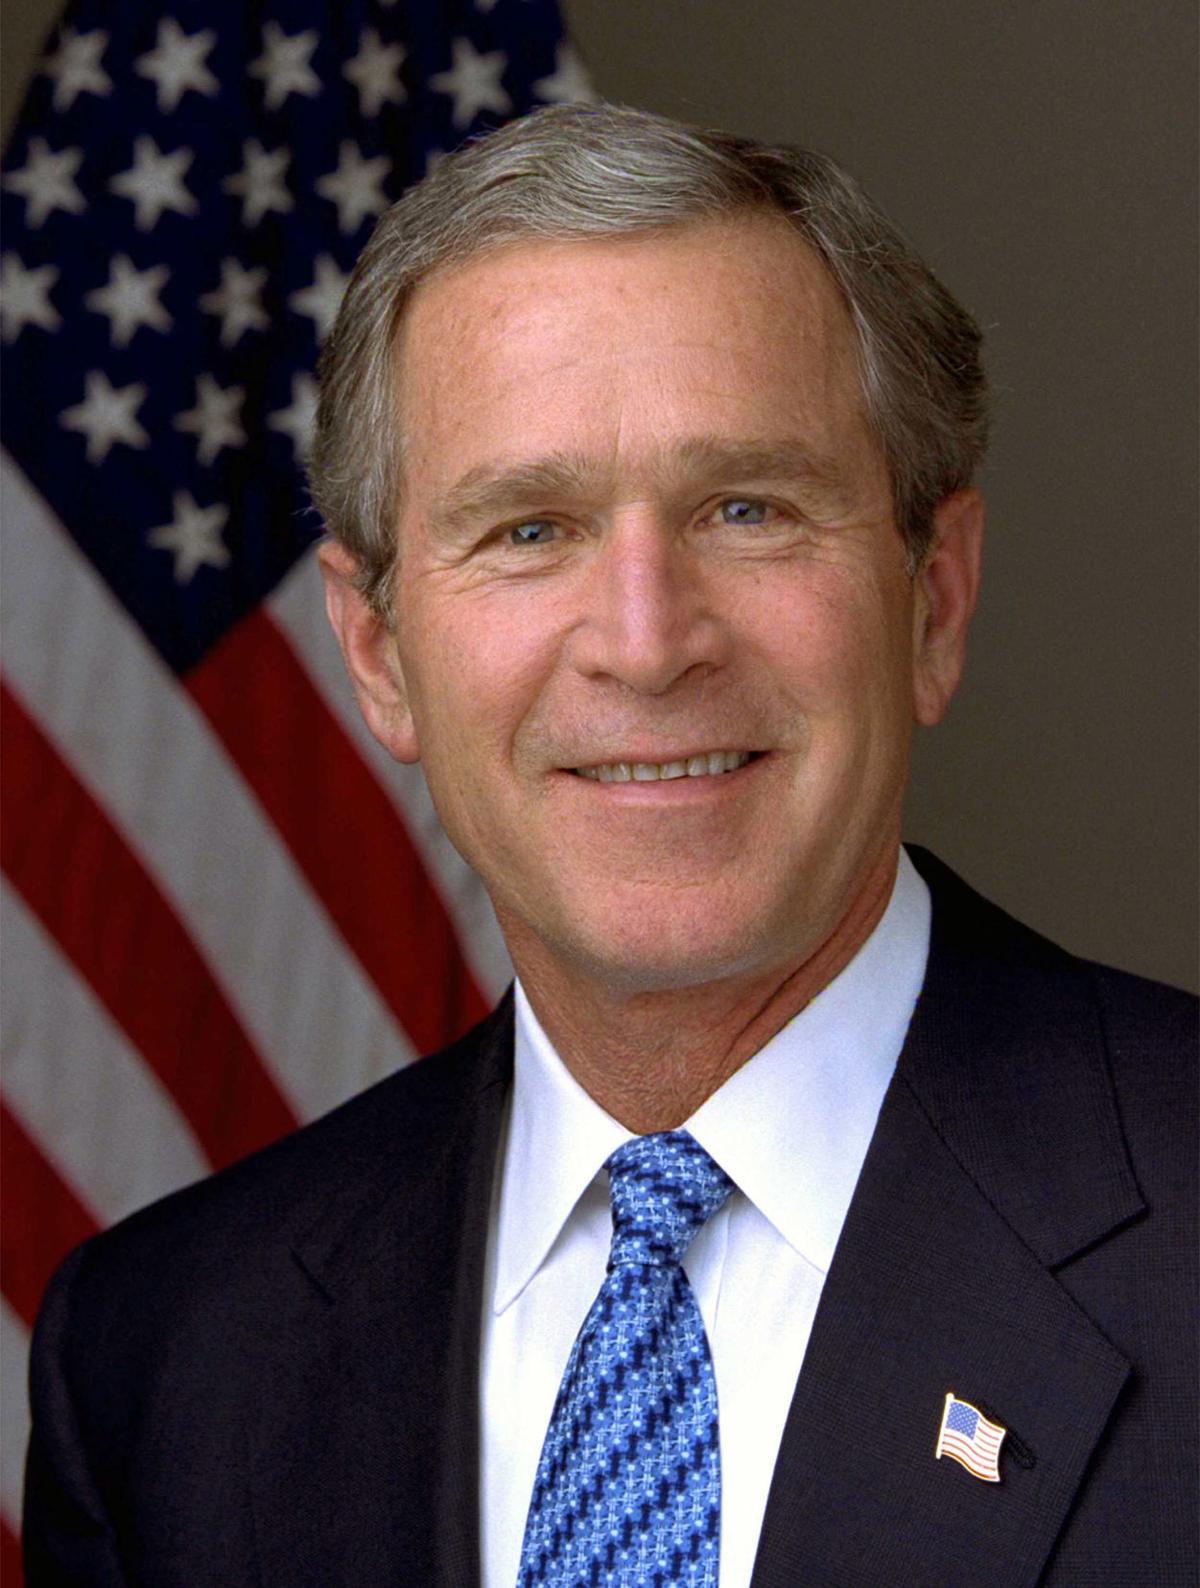 stock_george_w_bush_portrait.jpeg